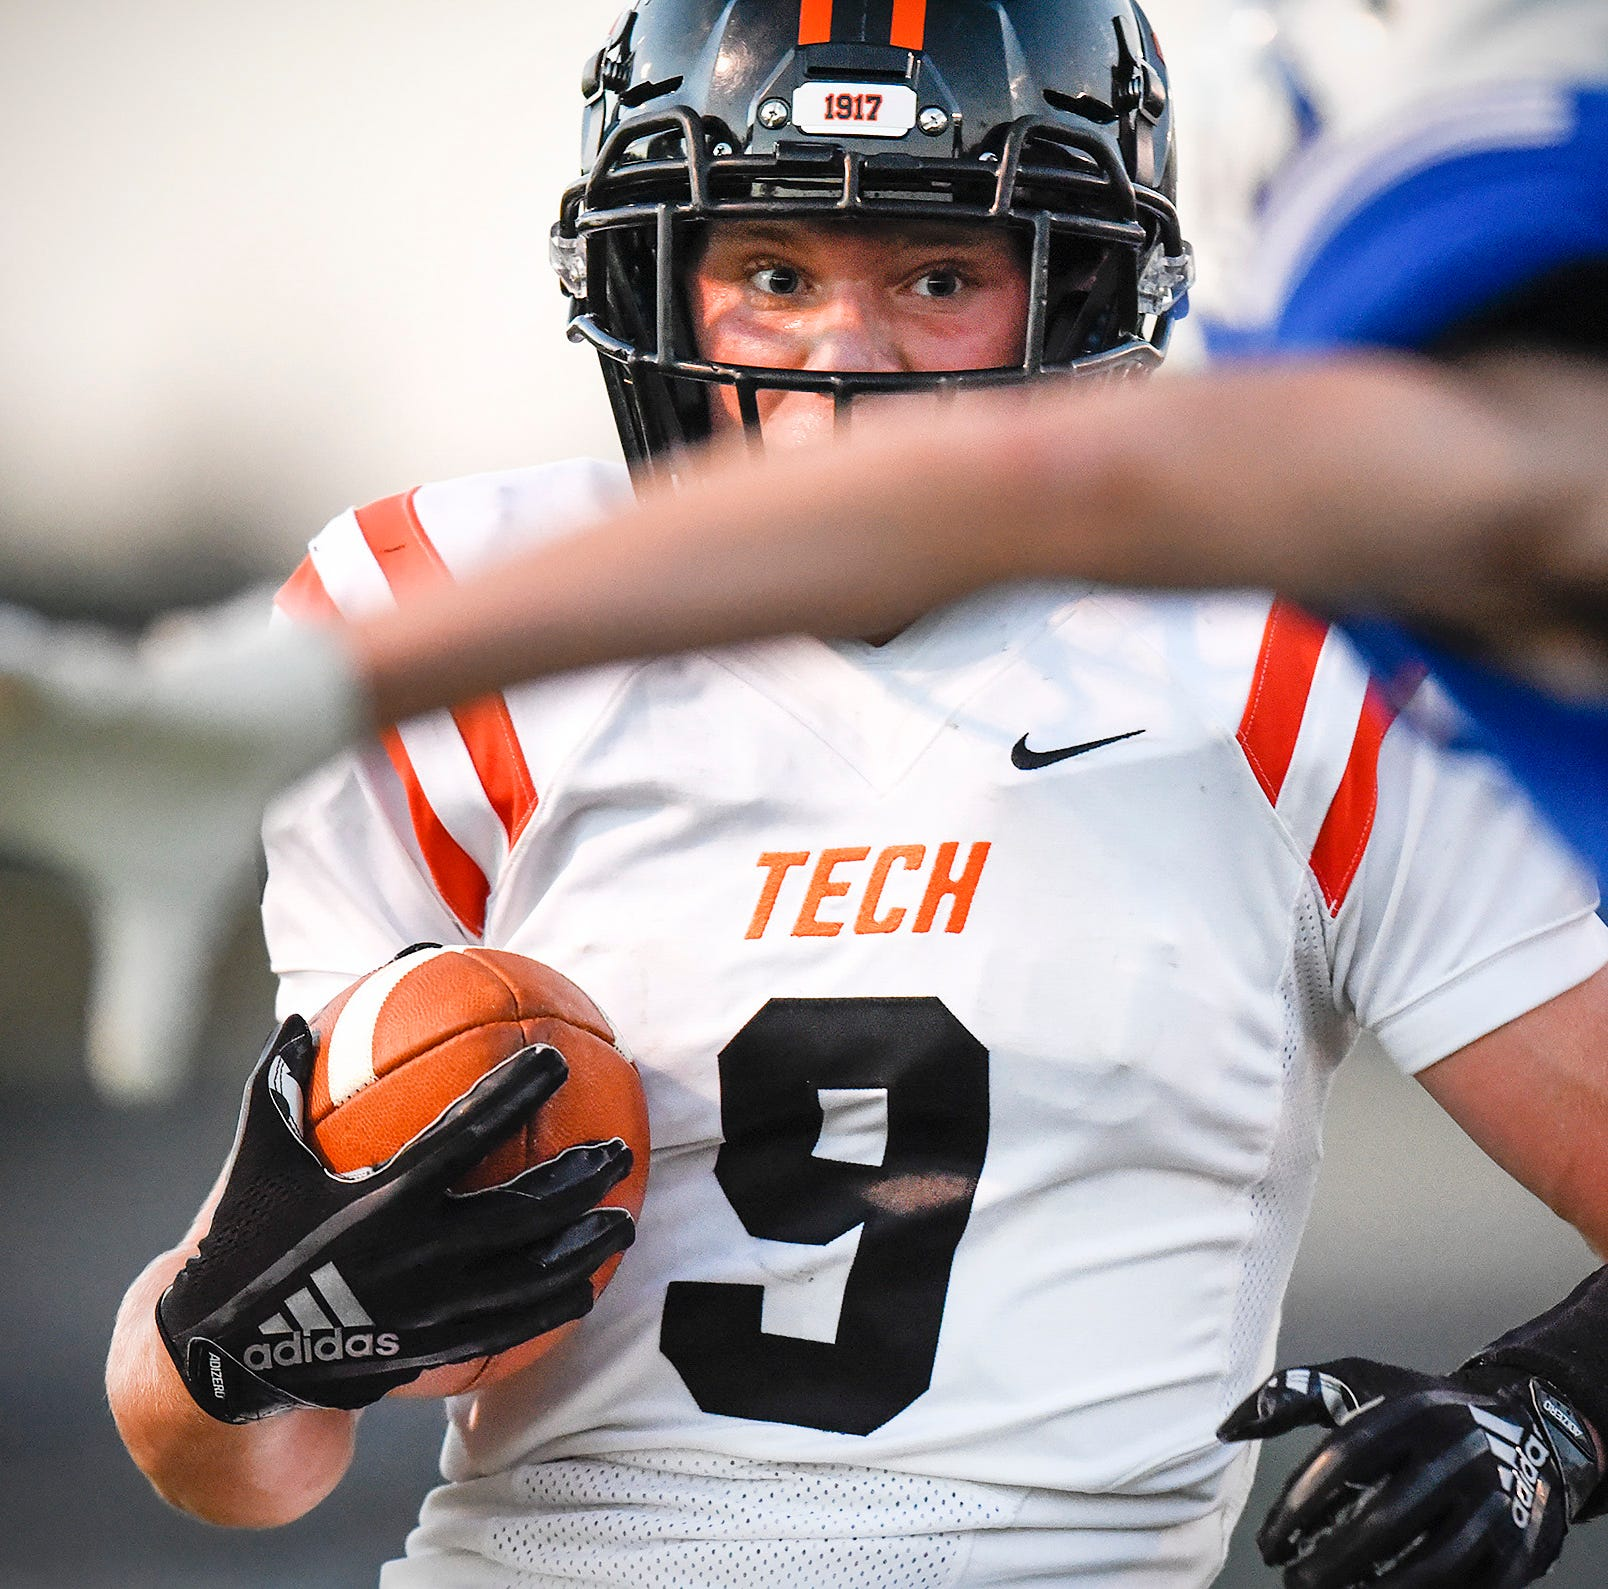 Senior linebackers come up big for Tech